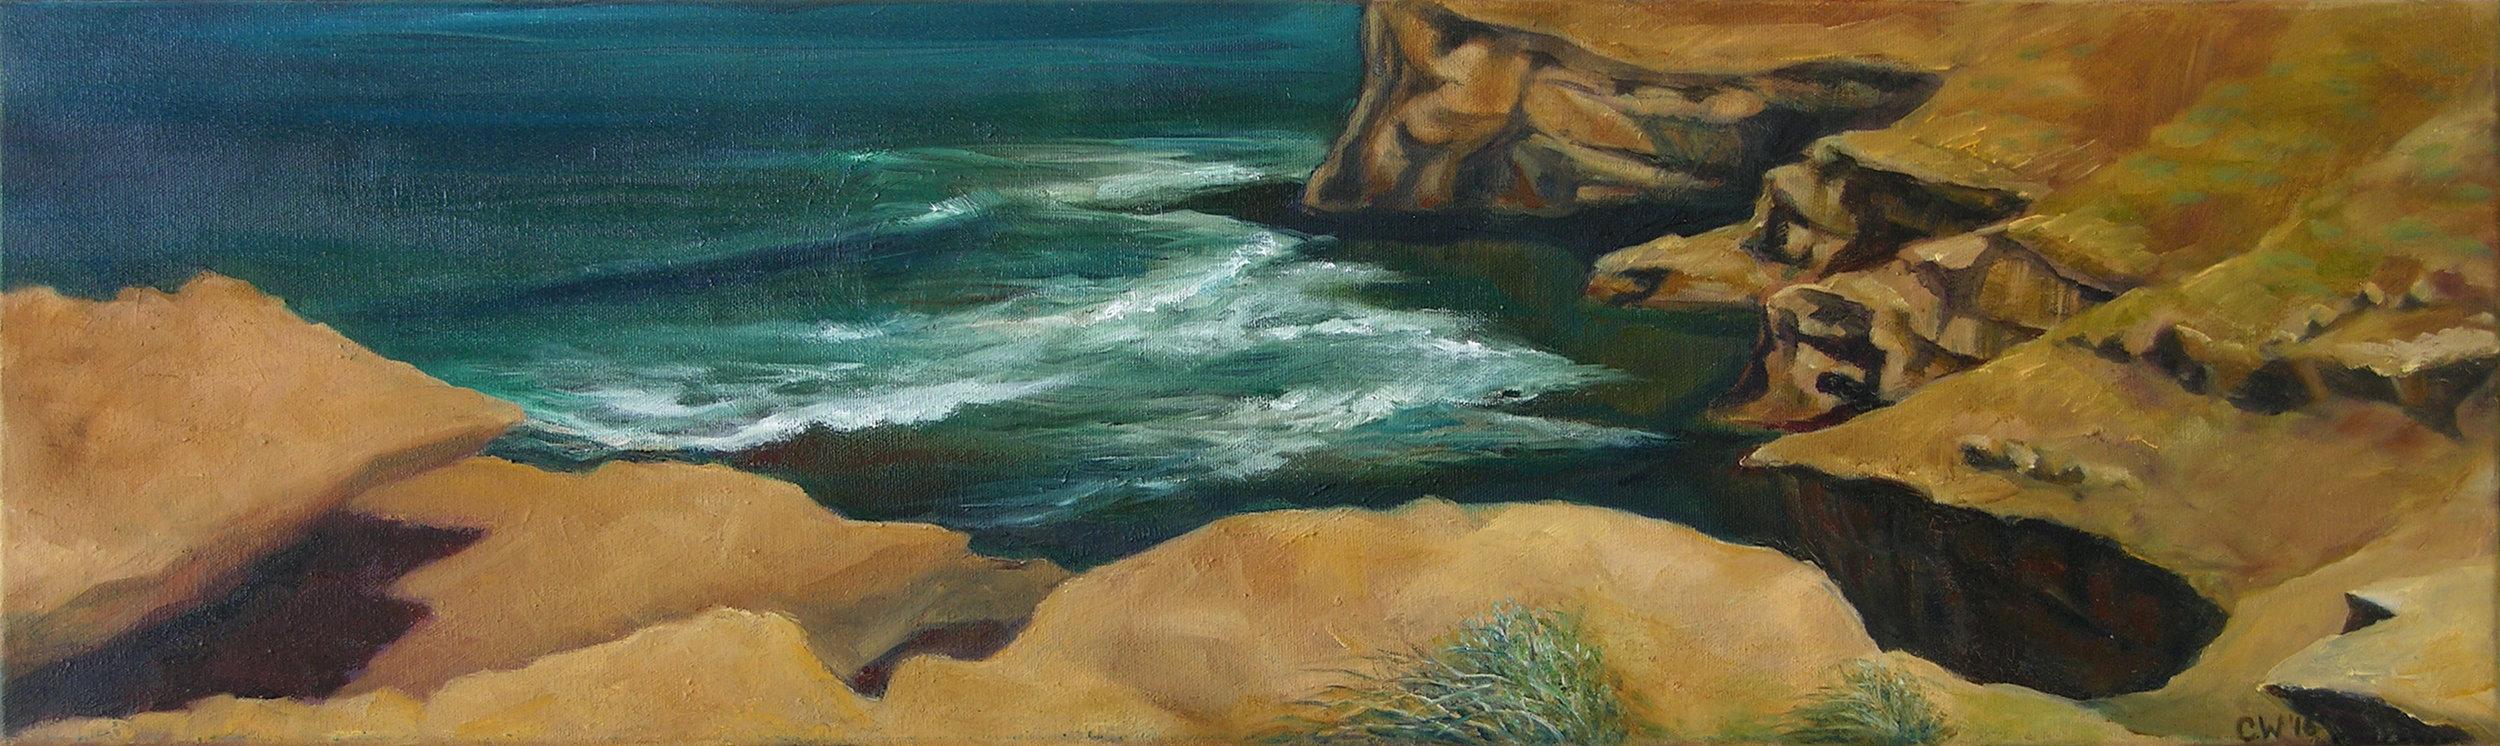 Cliff Edge and Waves 2 23 x 76cm.jpg